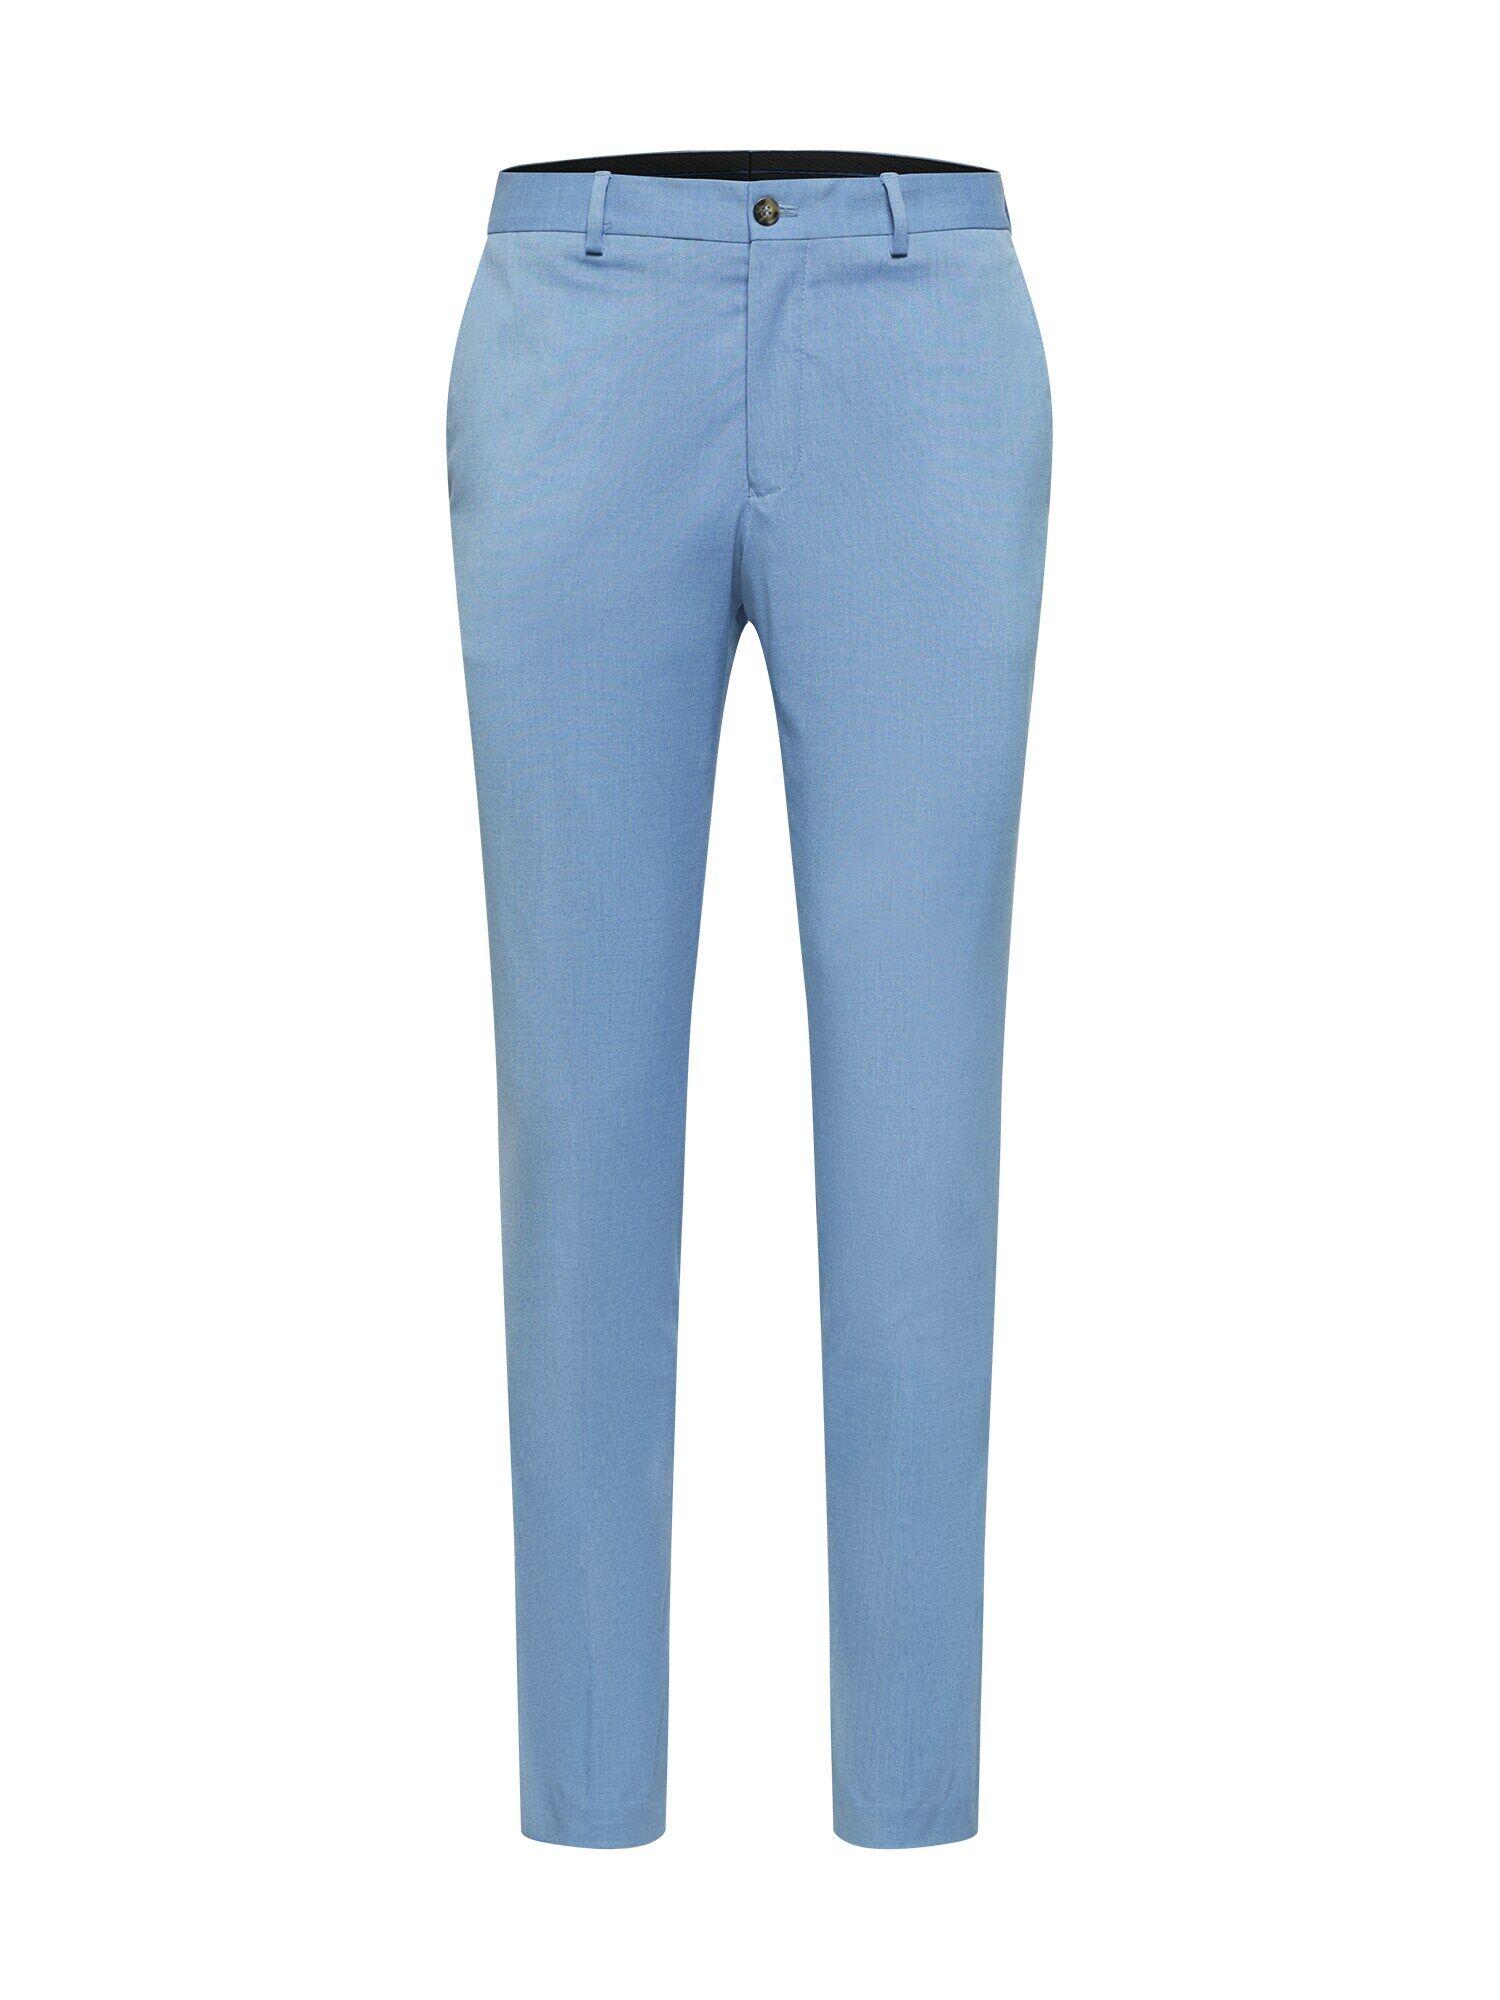 JACK & JONES Pantalon à pince  - Bleu - Taille: 54 - male